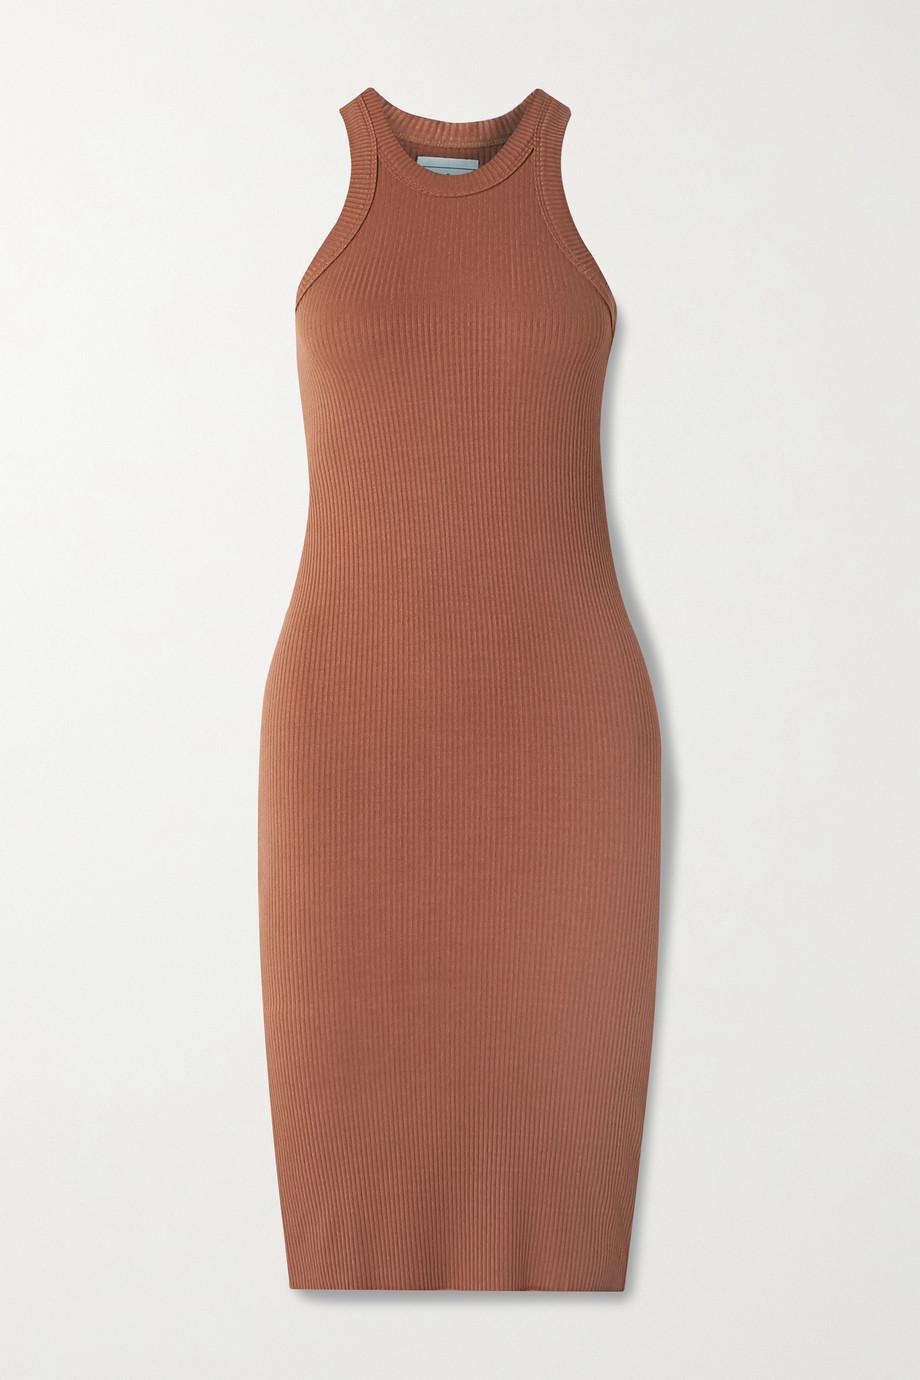 WSLY The Rivington Kleid aus geripptem Stretch-Jersey